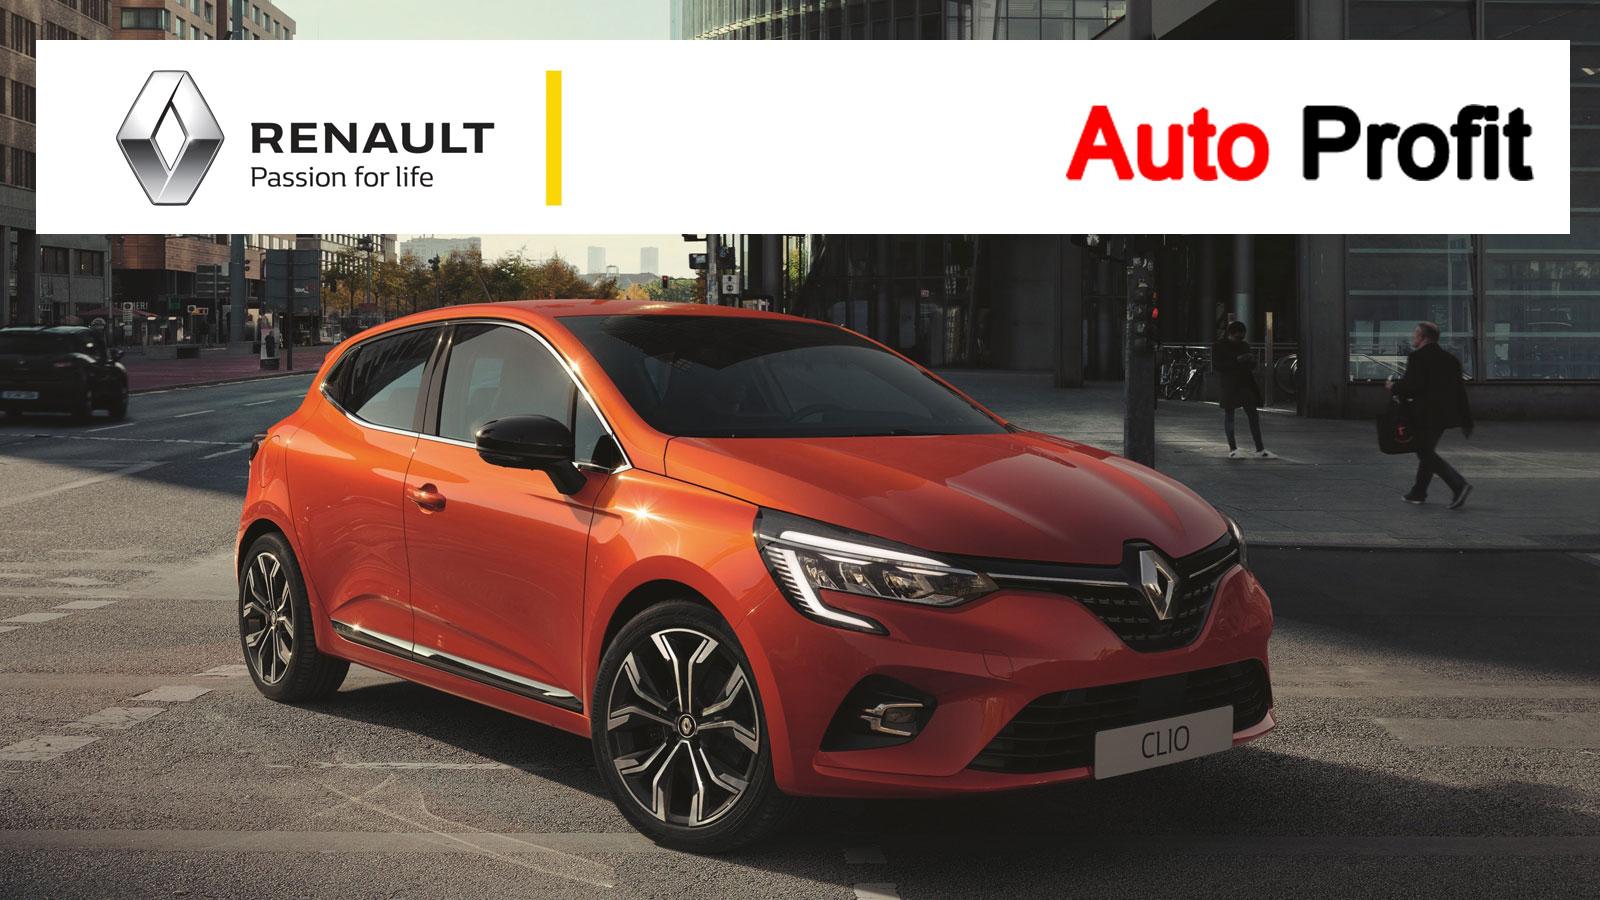 Mοναδική προσφορά της Auto Profit με επιπλέον έκπτωση 300 ευρώ, 15% προκαταβολή και εξόφληση μέχρι 84 μήνες.